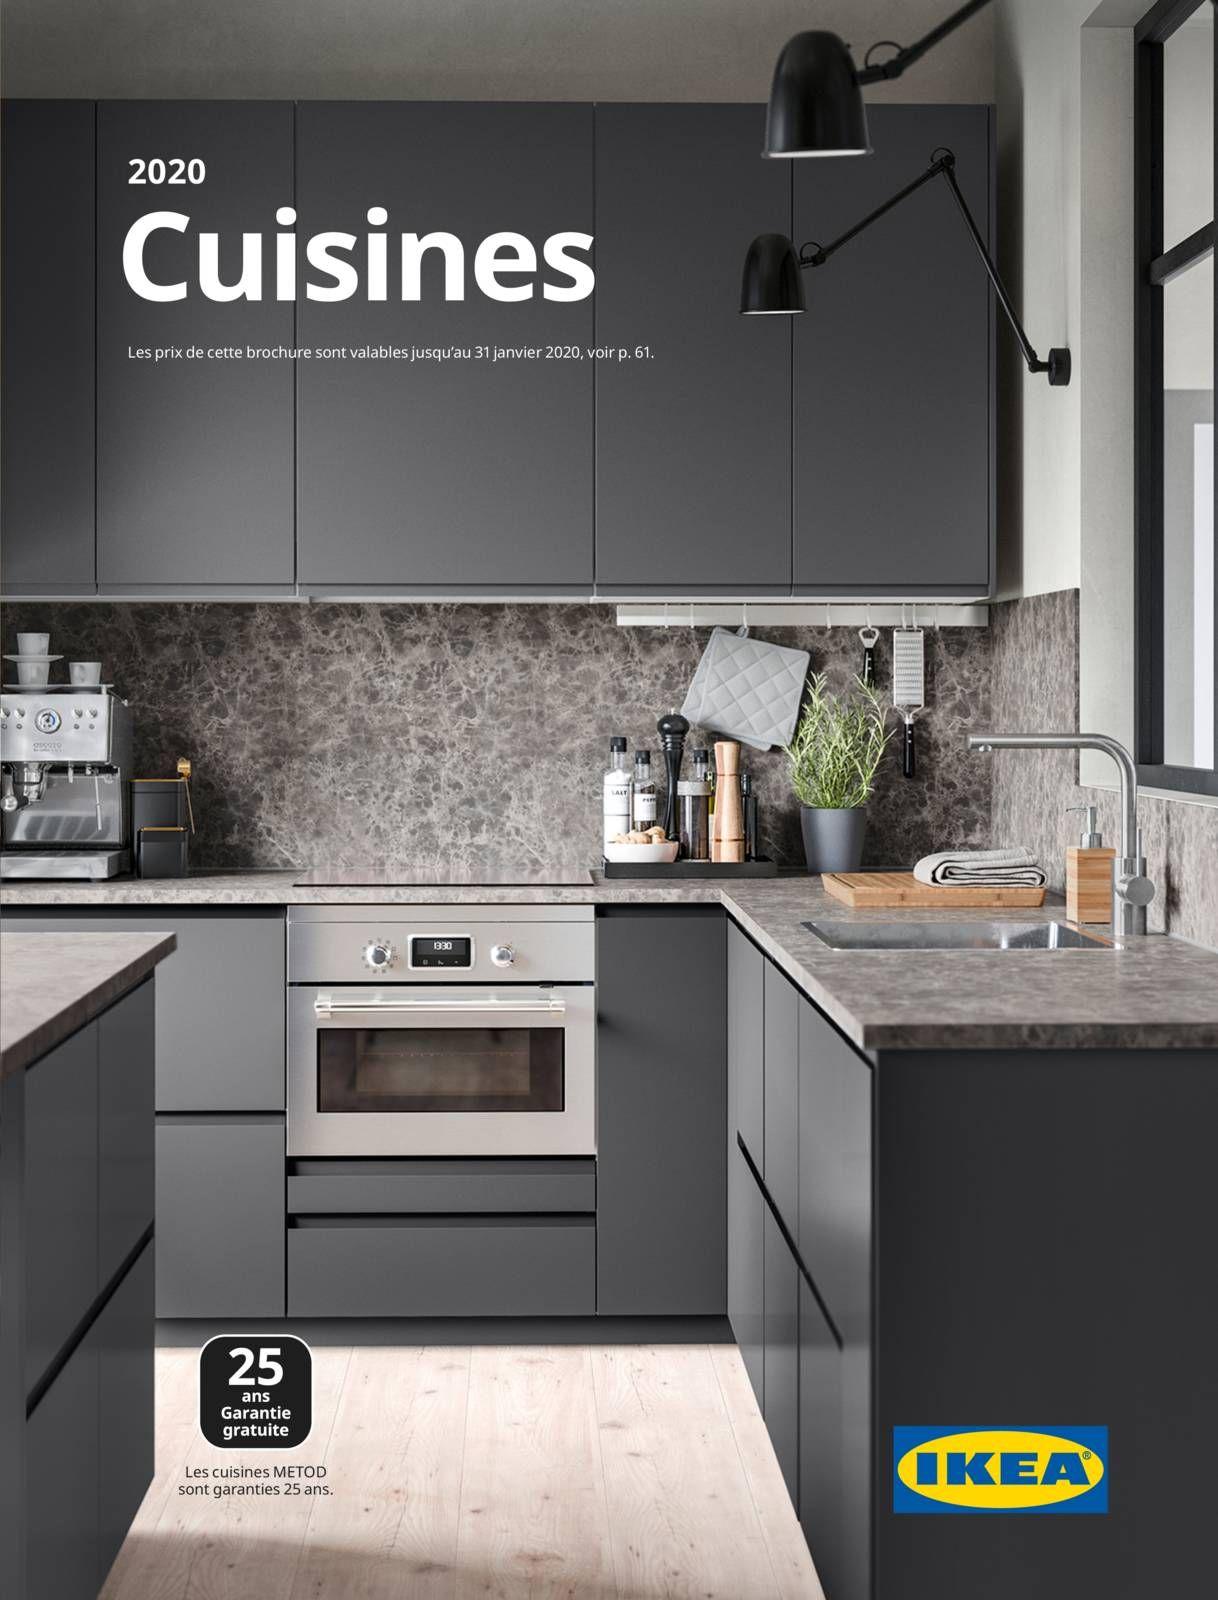 Cuisines 2020 Brochure Cuisines Ikea 2020 In 2020 Ikea Kitchen Catalogue Interior Design Kitchen Ikea Kitchen Australia